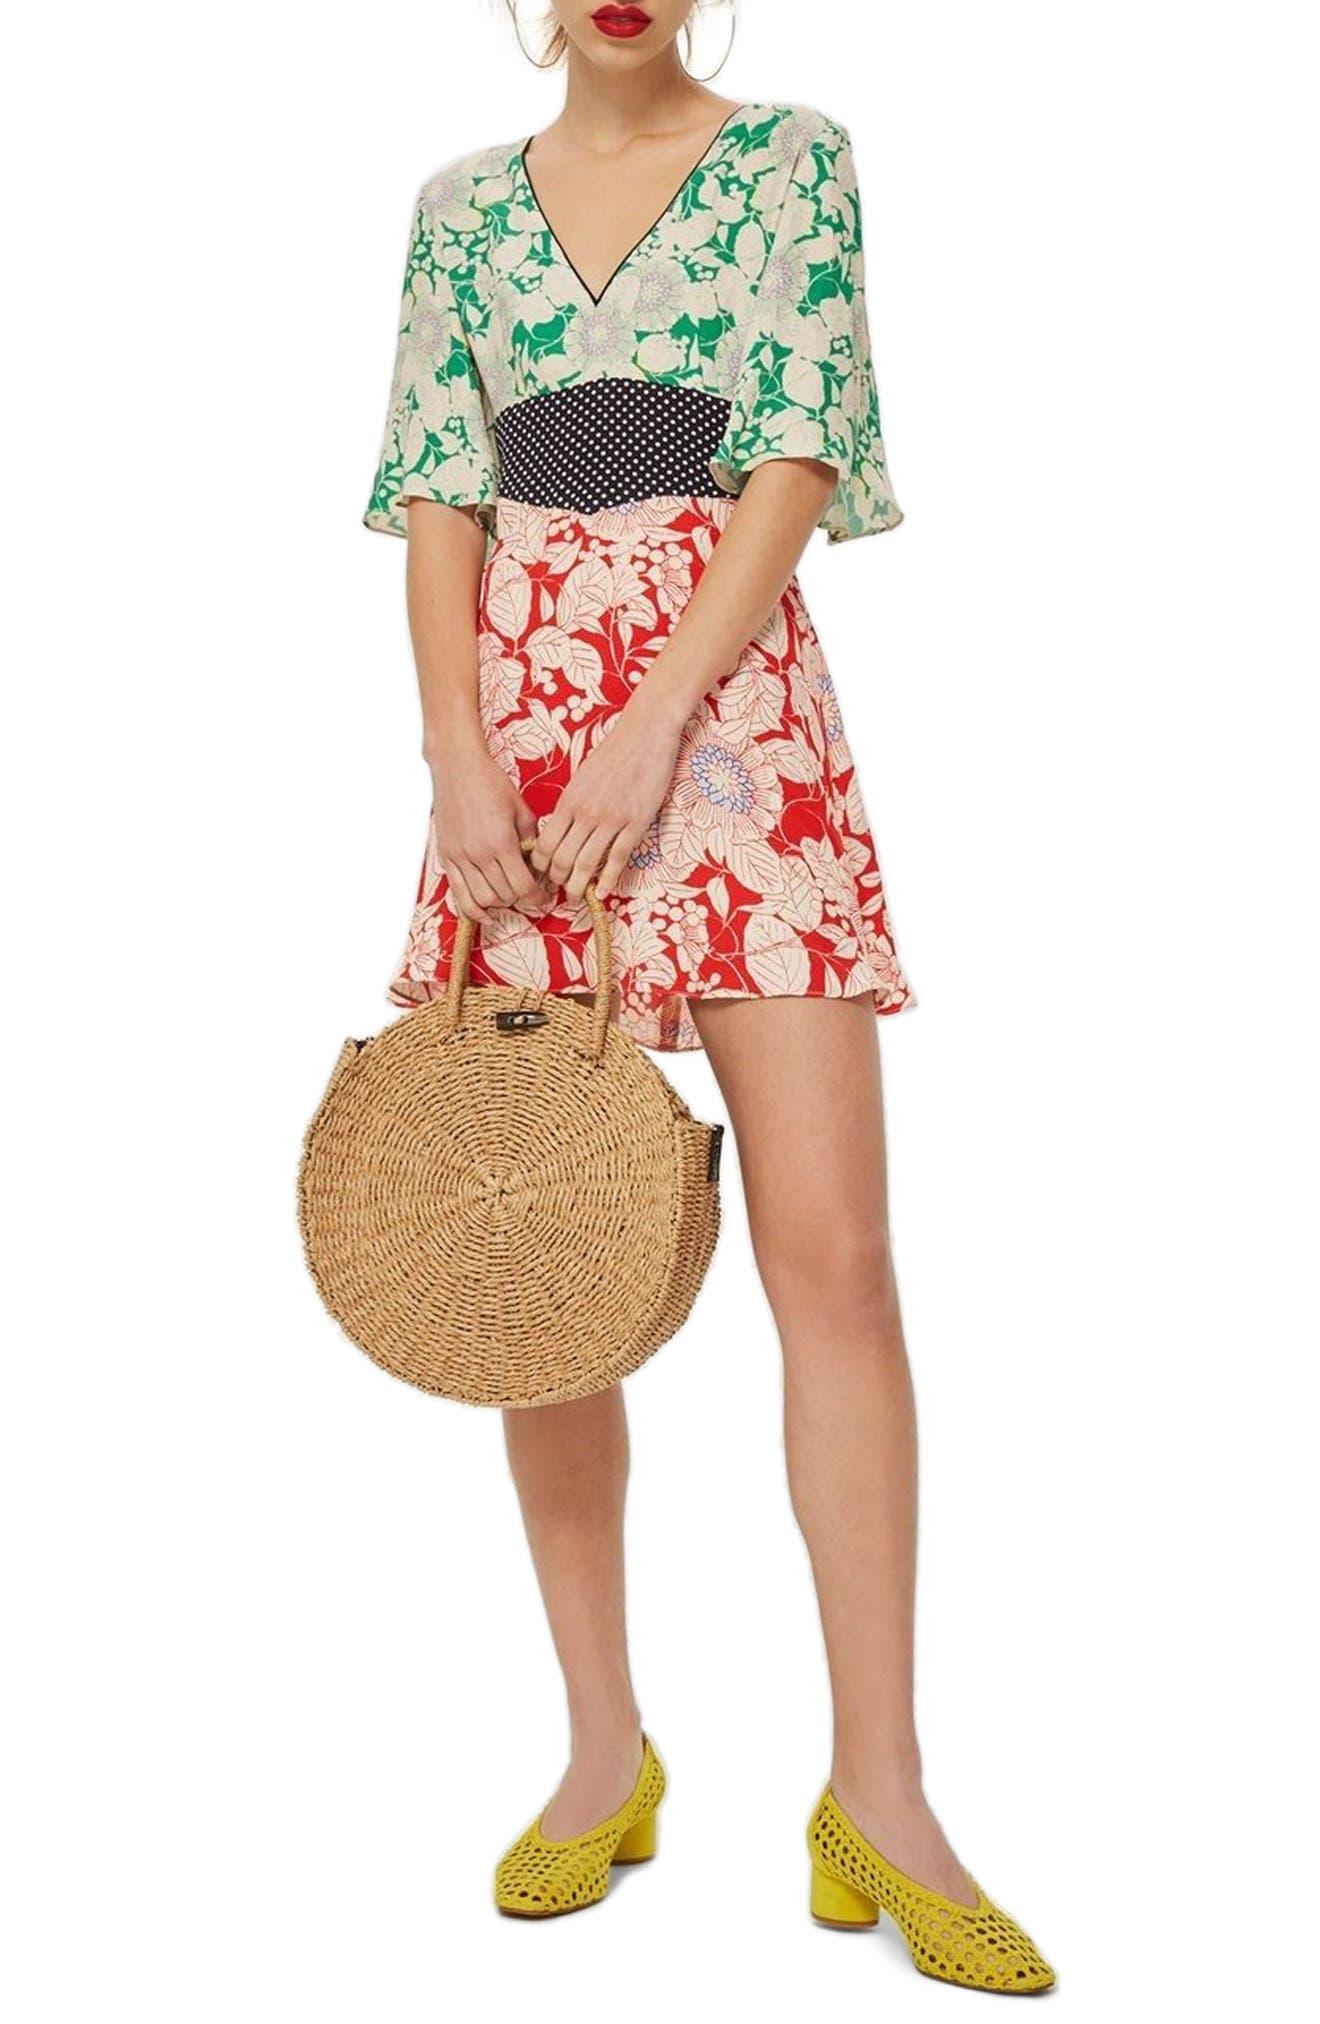 Topshop Mix Floral Print Minidress